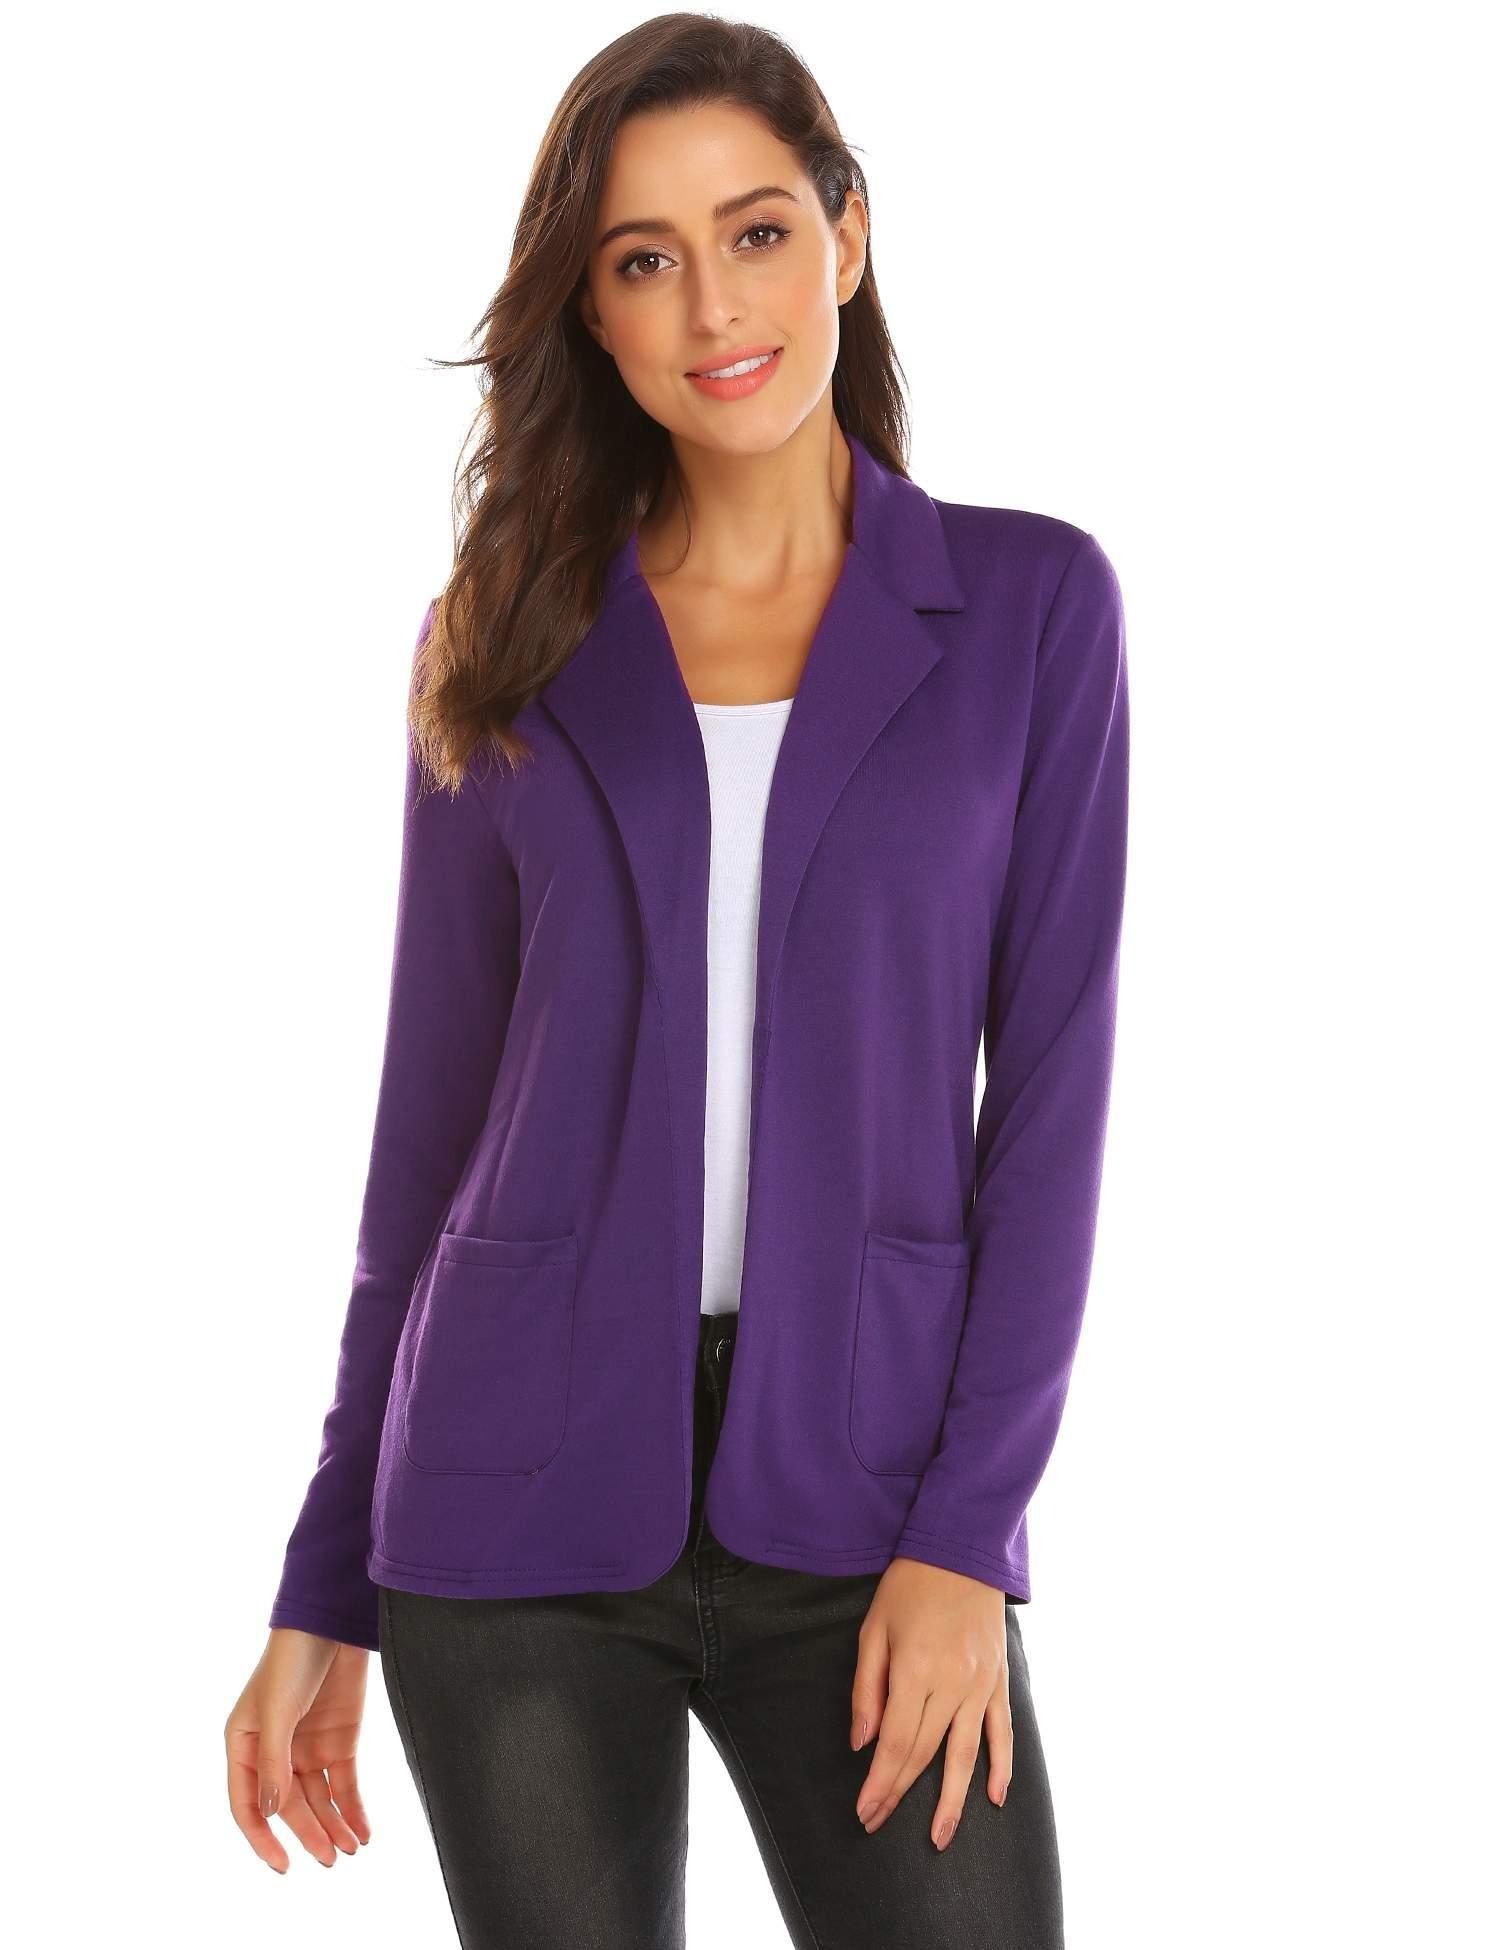 Yealsha Women's Blazer Jacket Lightweight Casual Slim Fit Sport Jacket Suit Coat Purple XXL